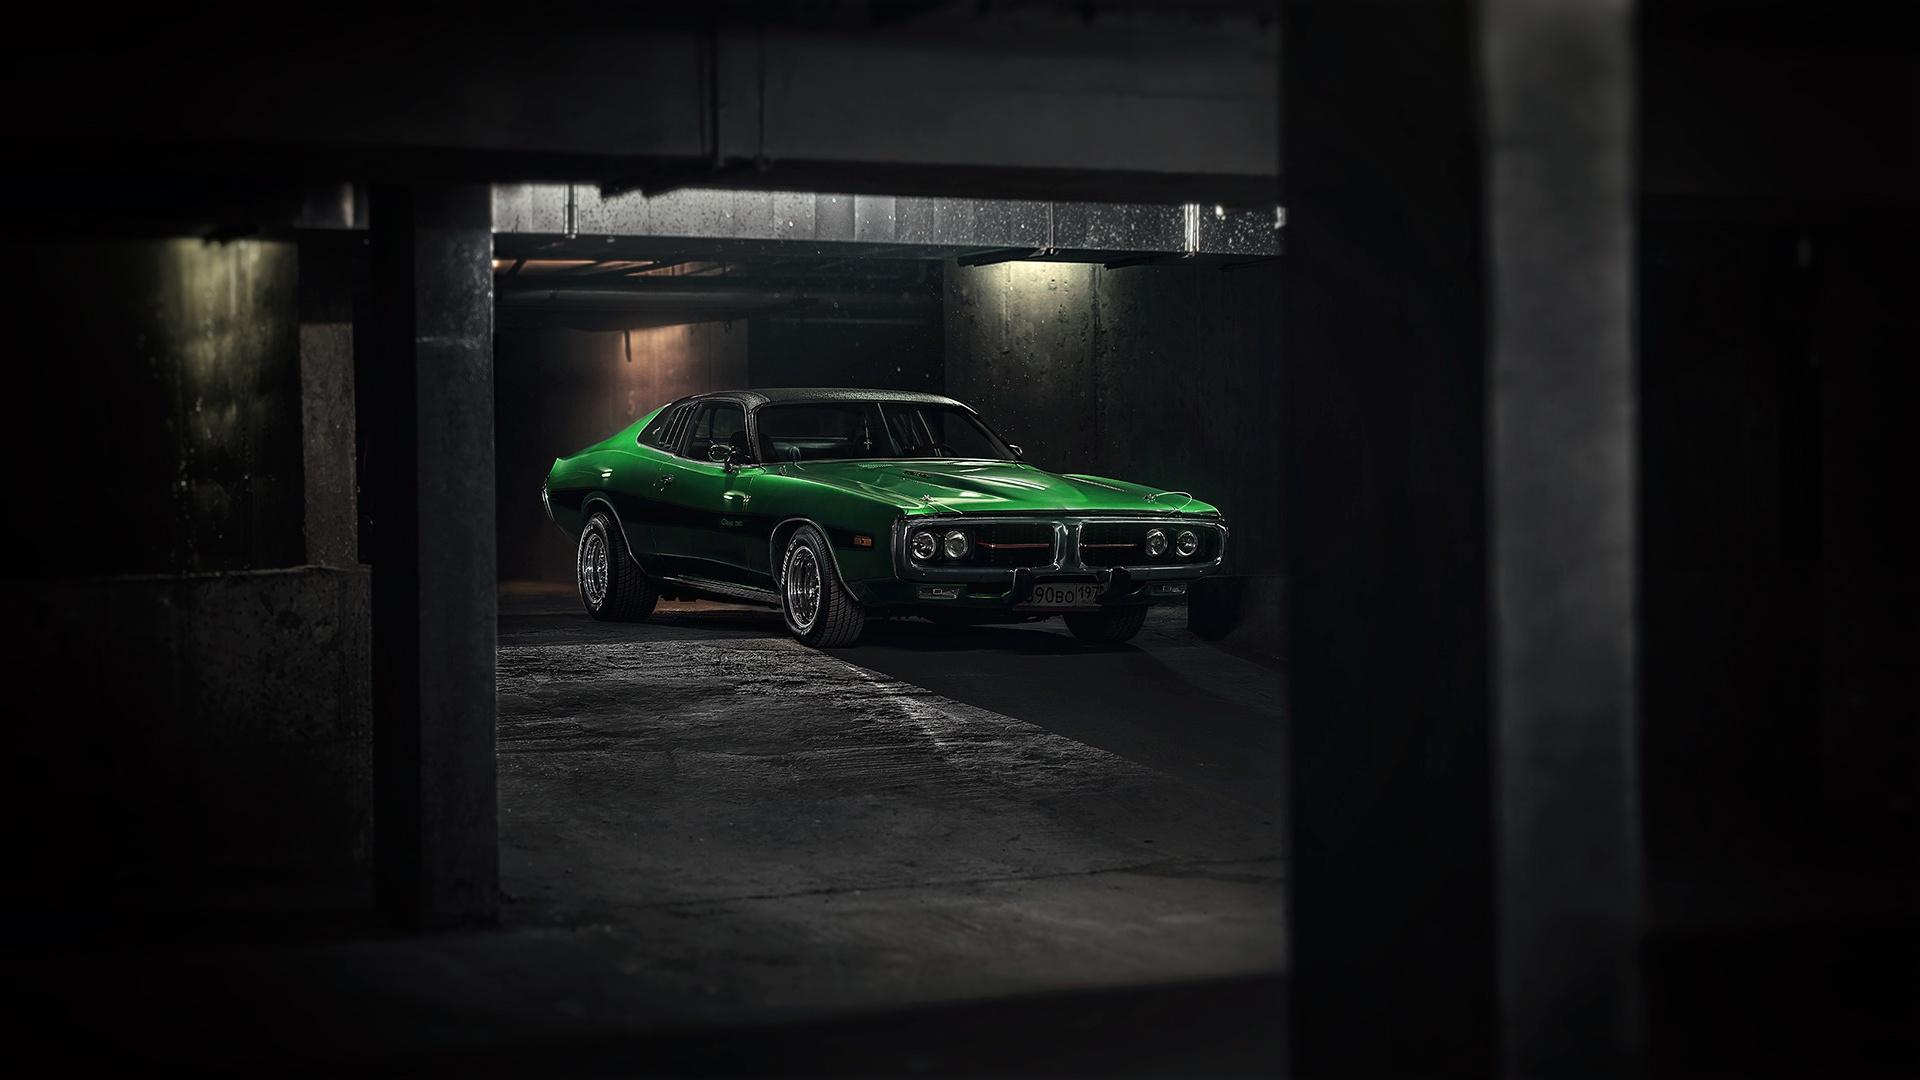 Wallpaper Green Cars Dark Car Vehicle Dodge Charger